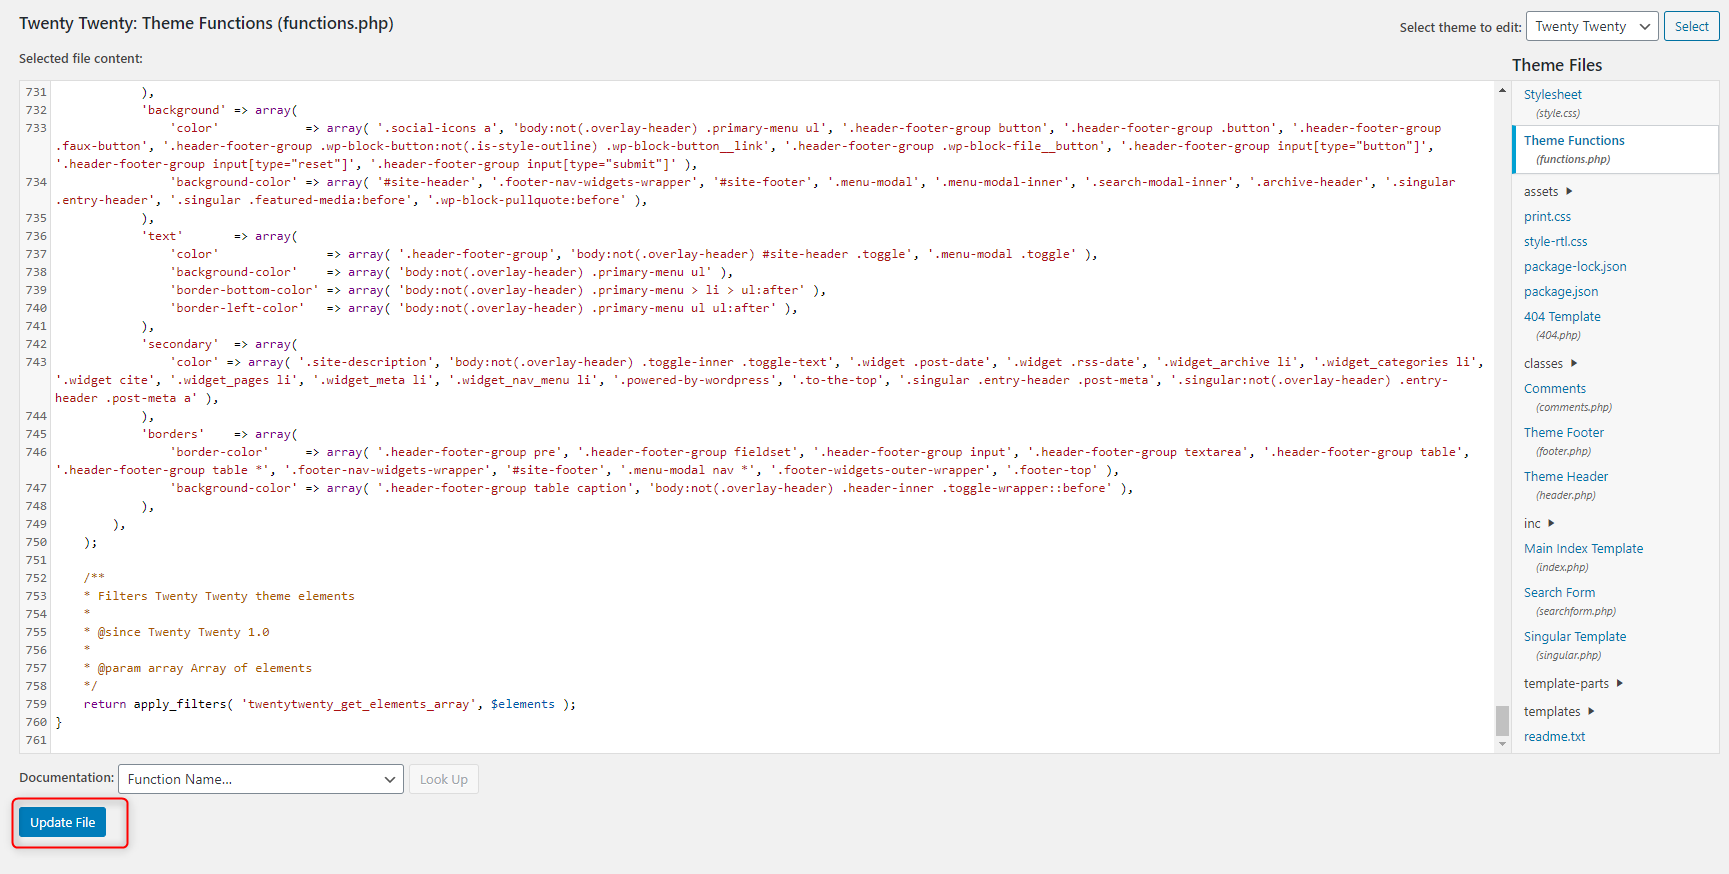 How to Add Custom PHP Code in WordPress - Theme editor - Update File